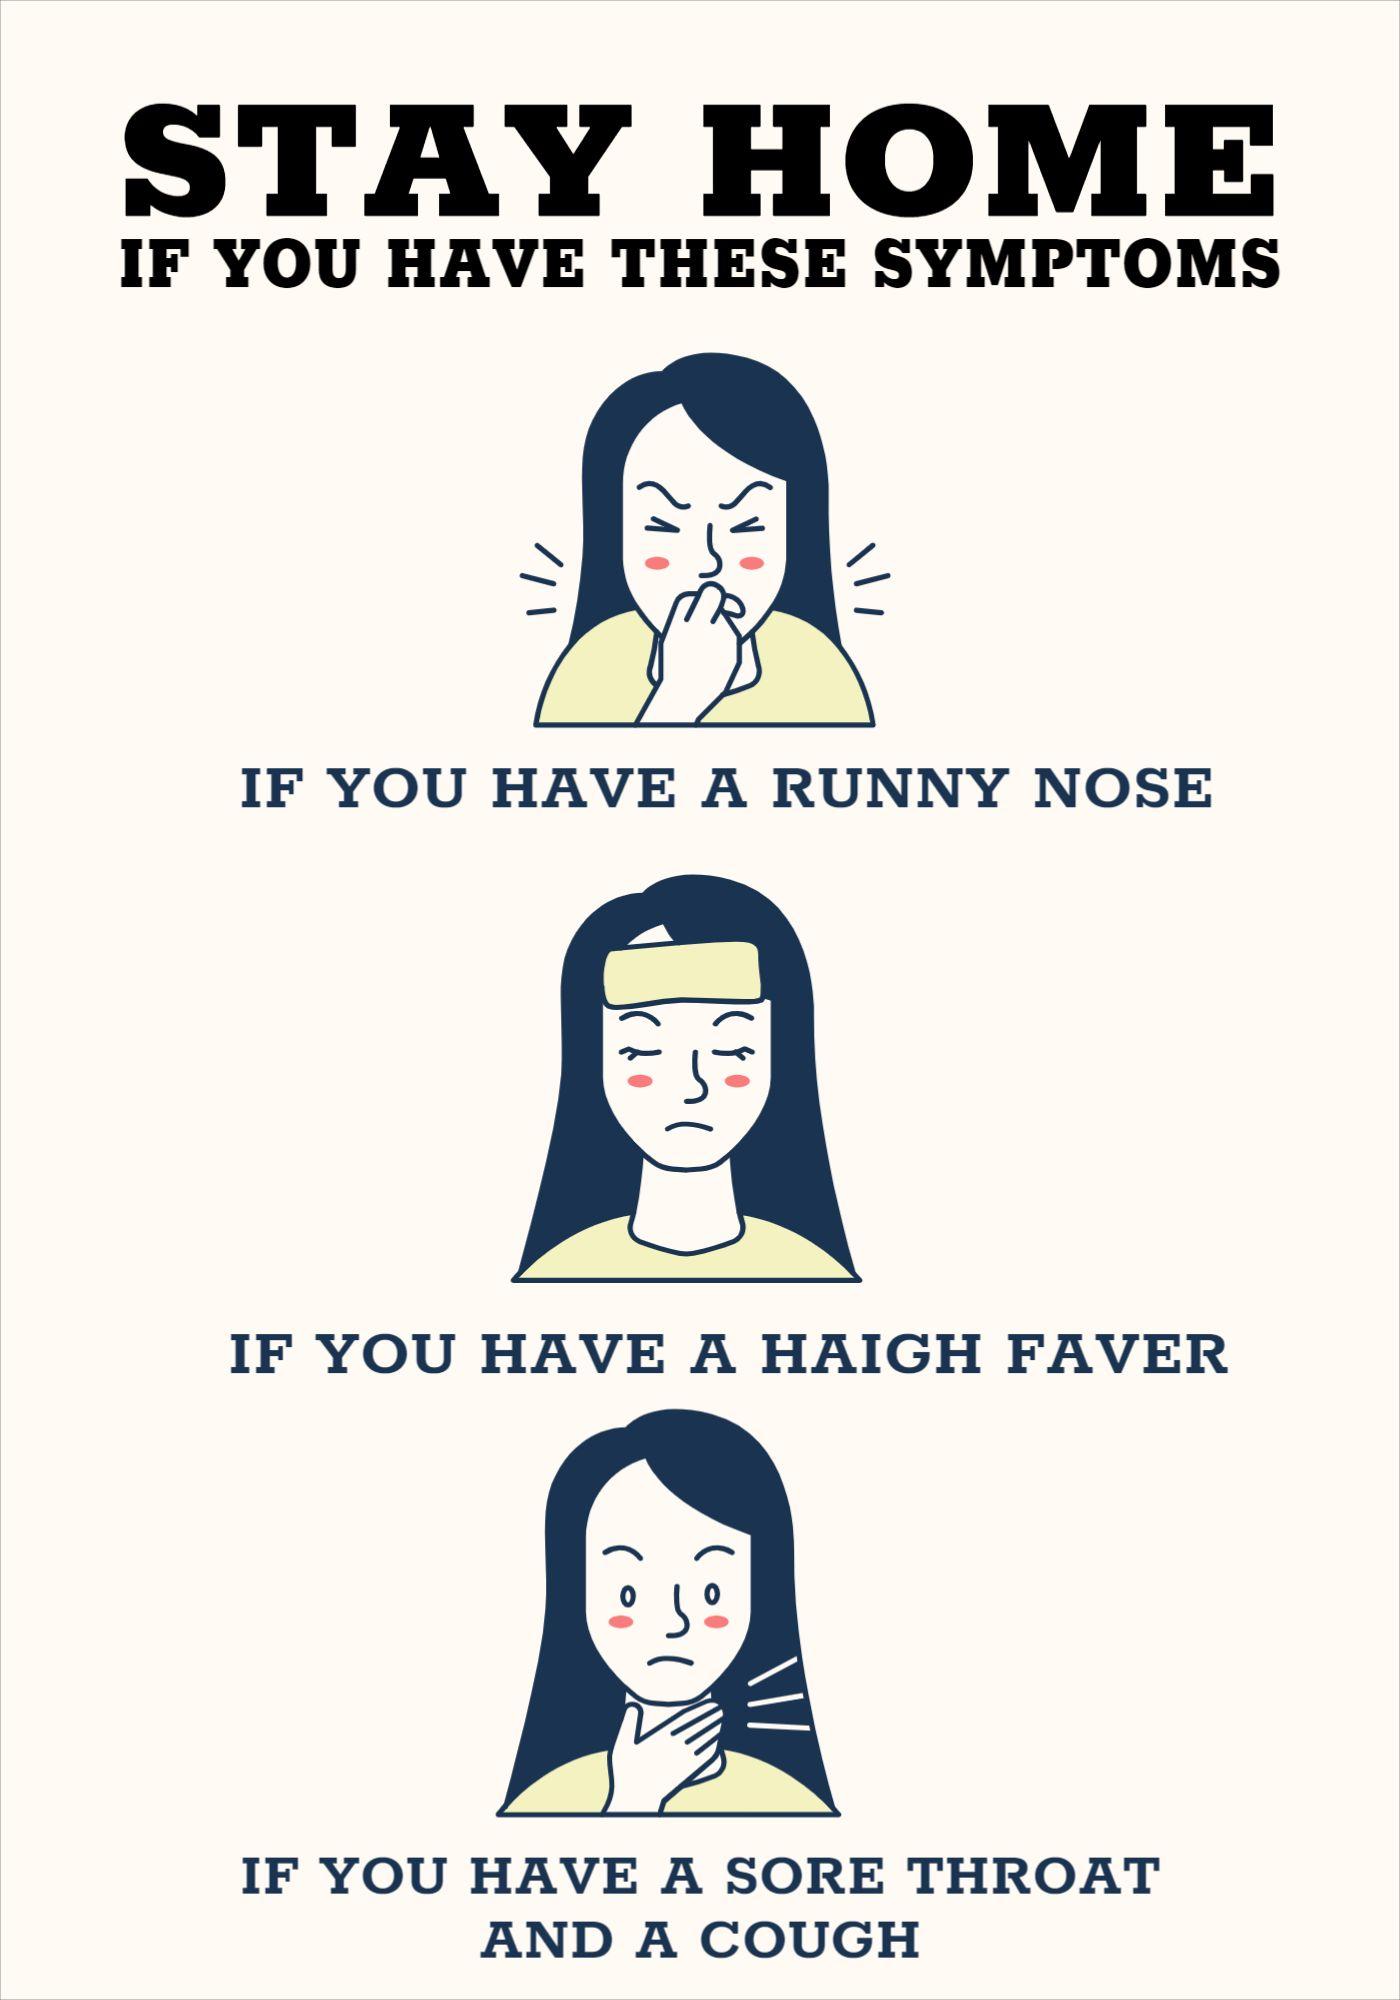 Poster Symptoms Covid-19 Template